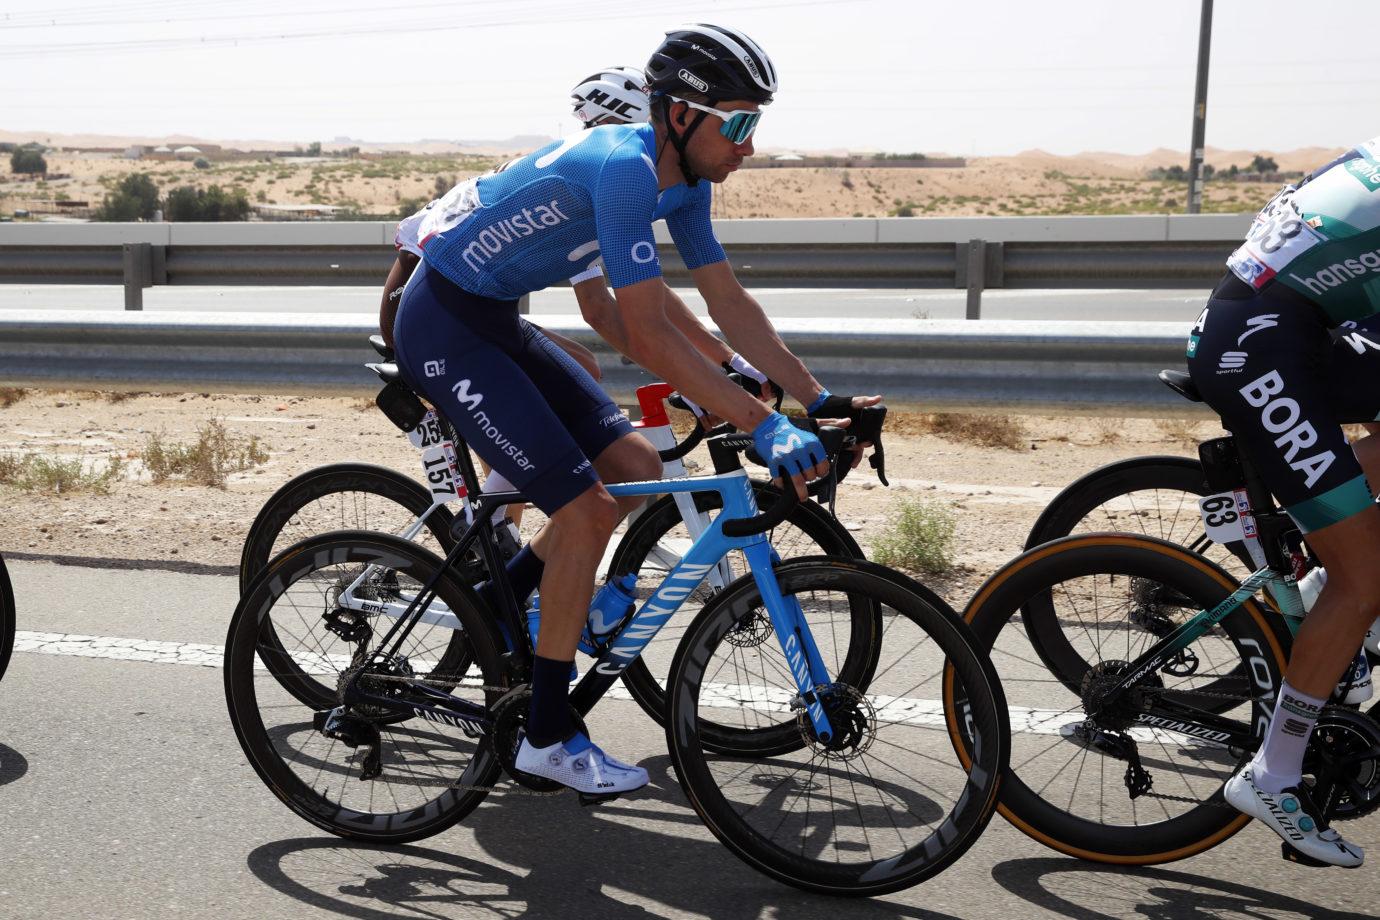 Imagen de la noticia 'Villella top Movistar Team finisher at Jebel Hafeet'